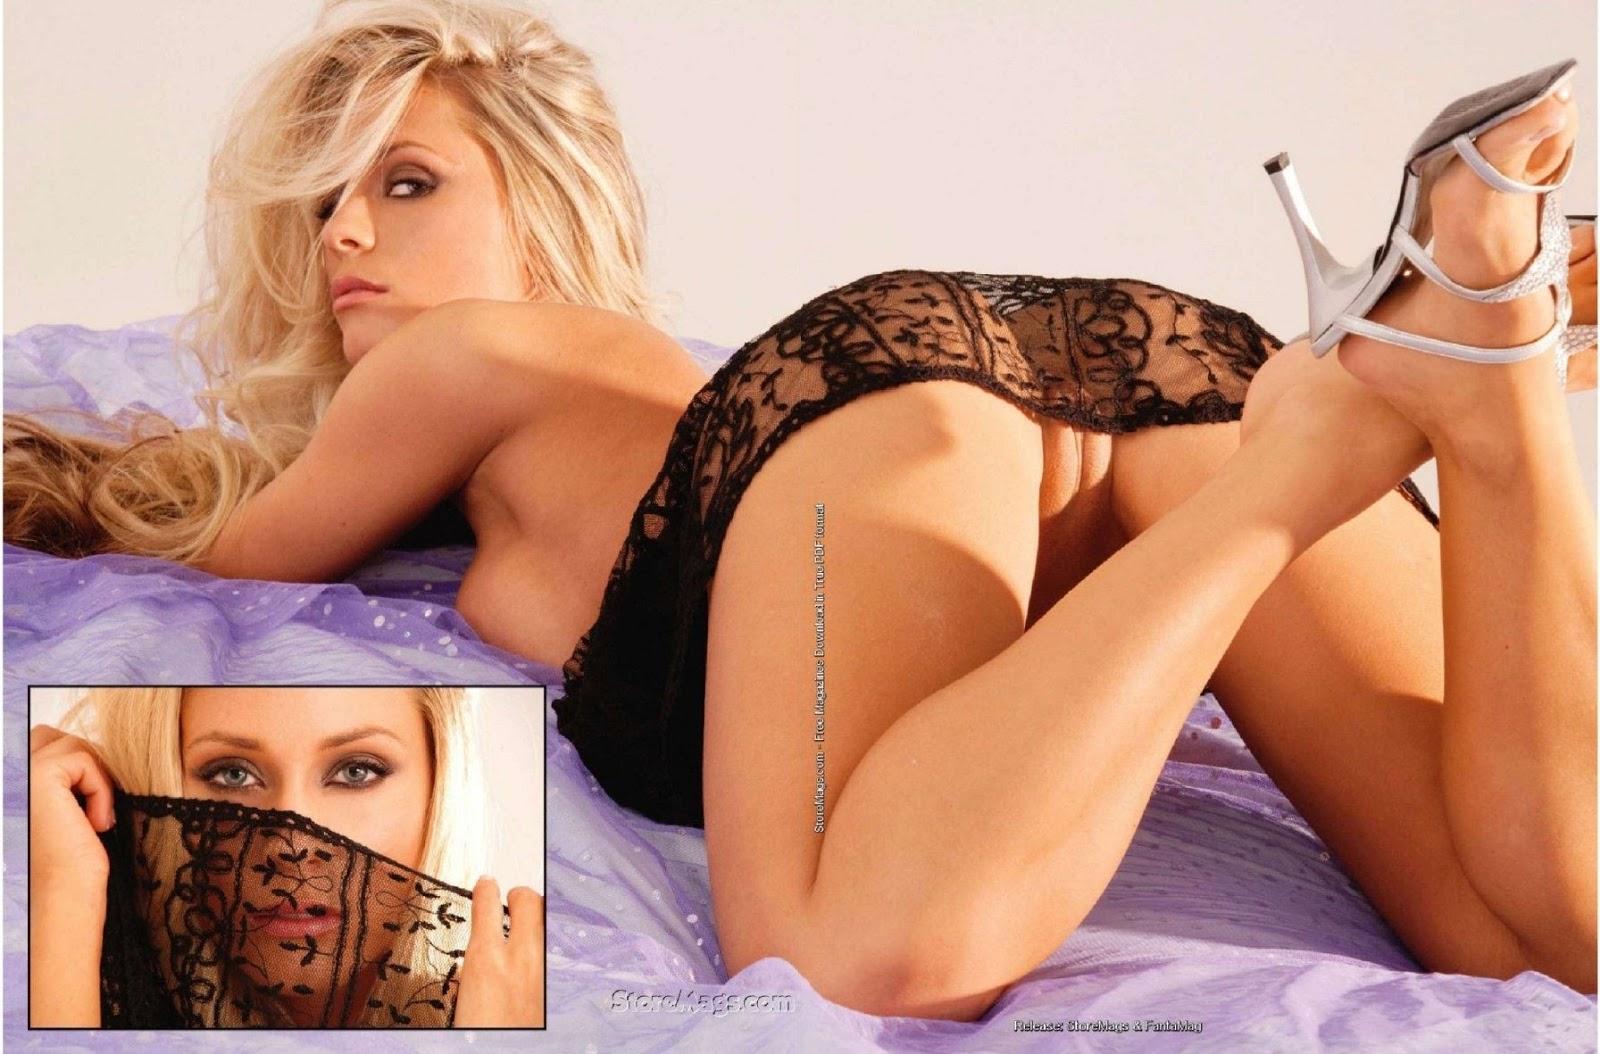 Arianny celleste desnuda para playboy